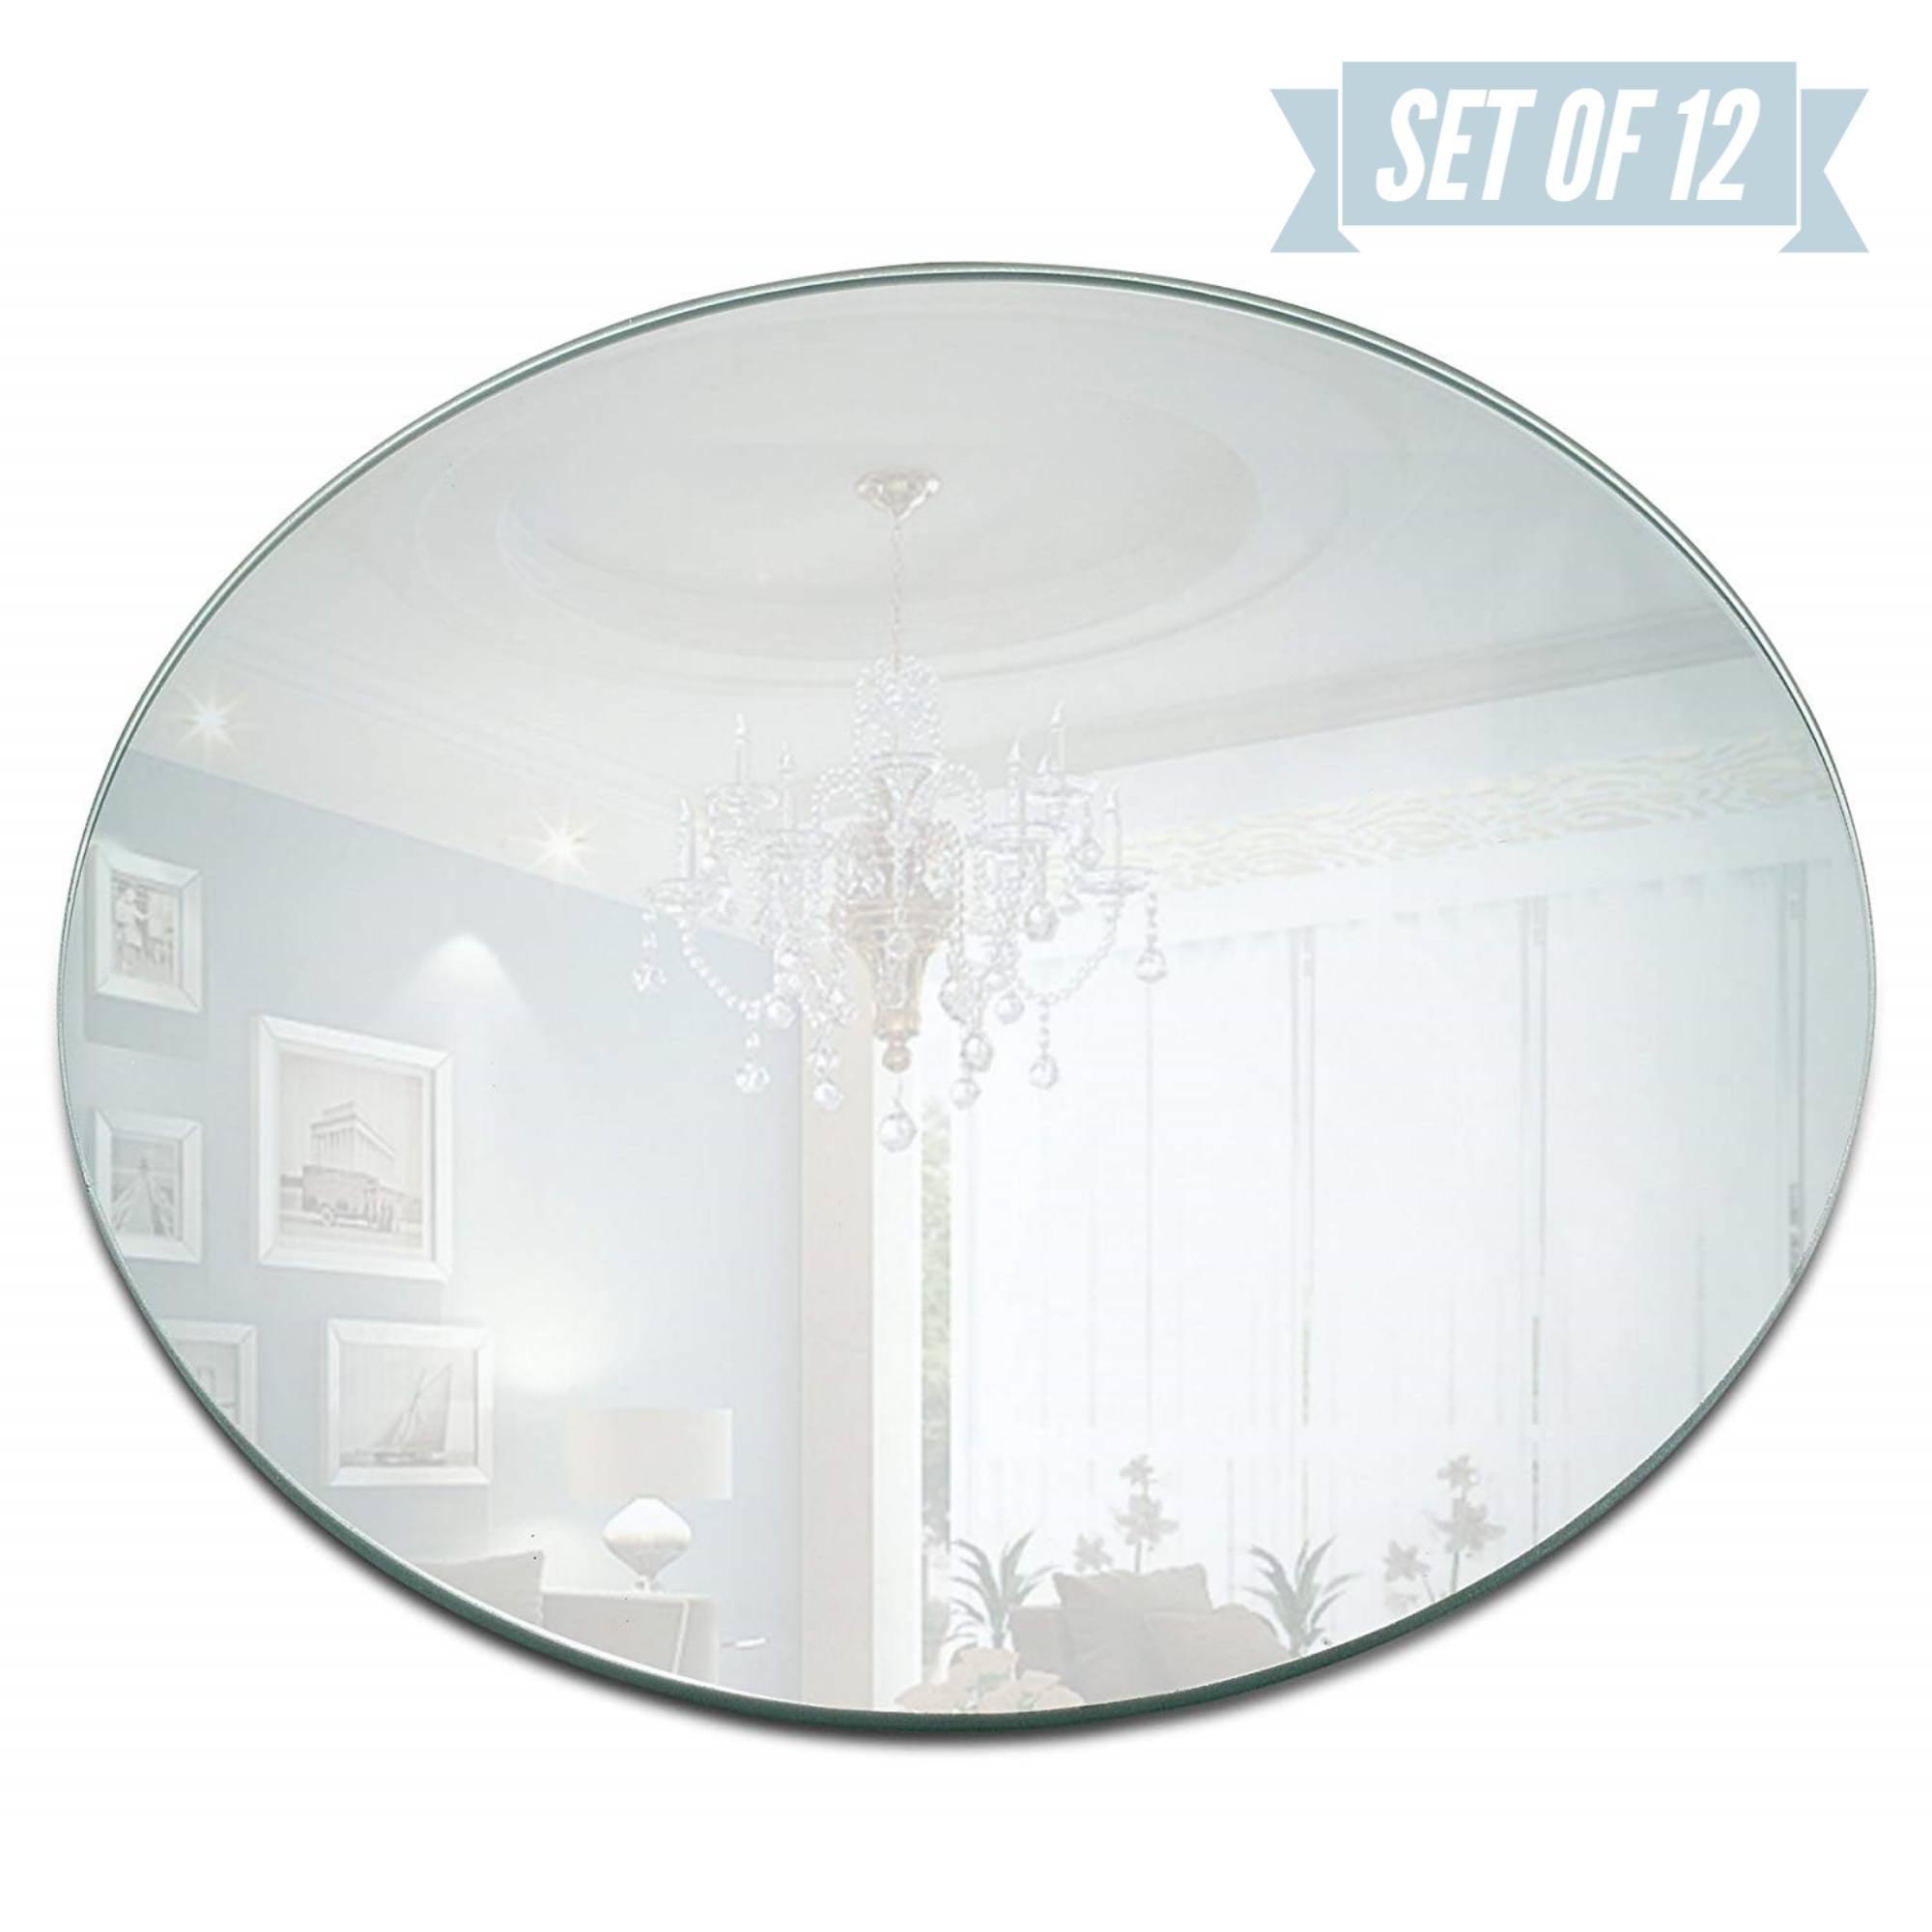 Darice Round Mirror Wedding Table Centerpieces Sanded Egdes 10 Pieces 12 Inches